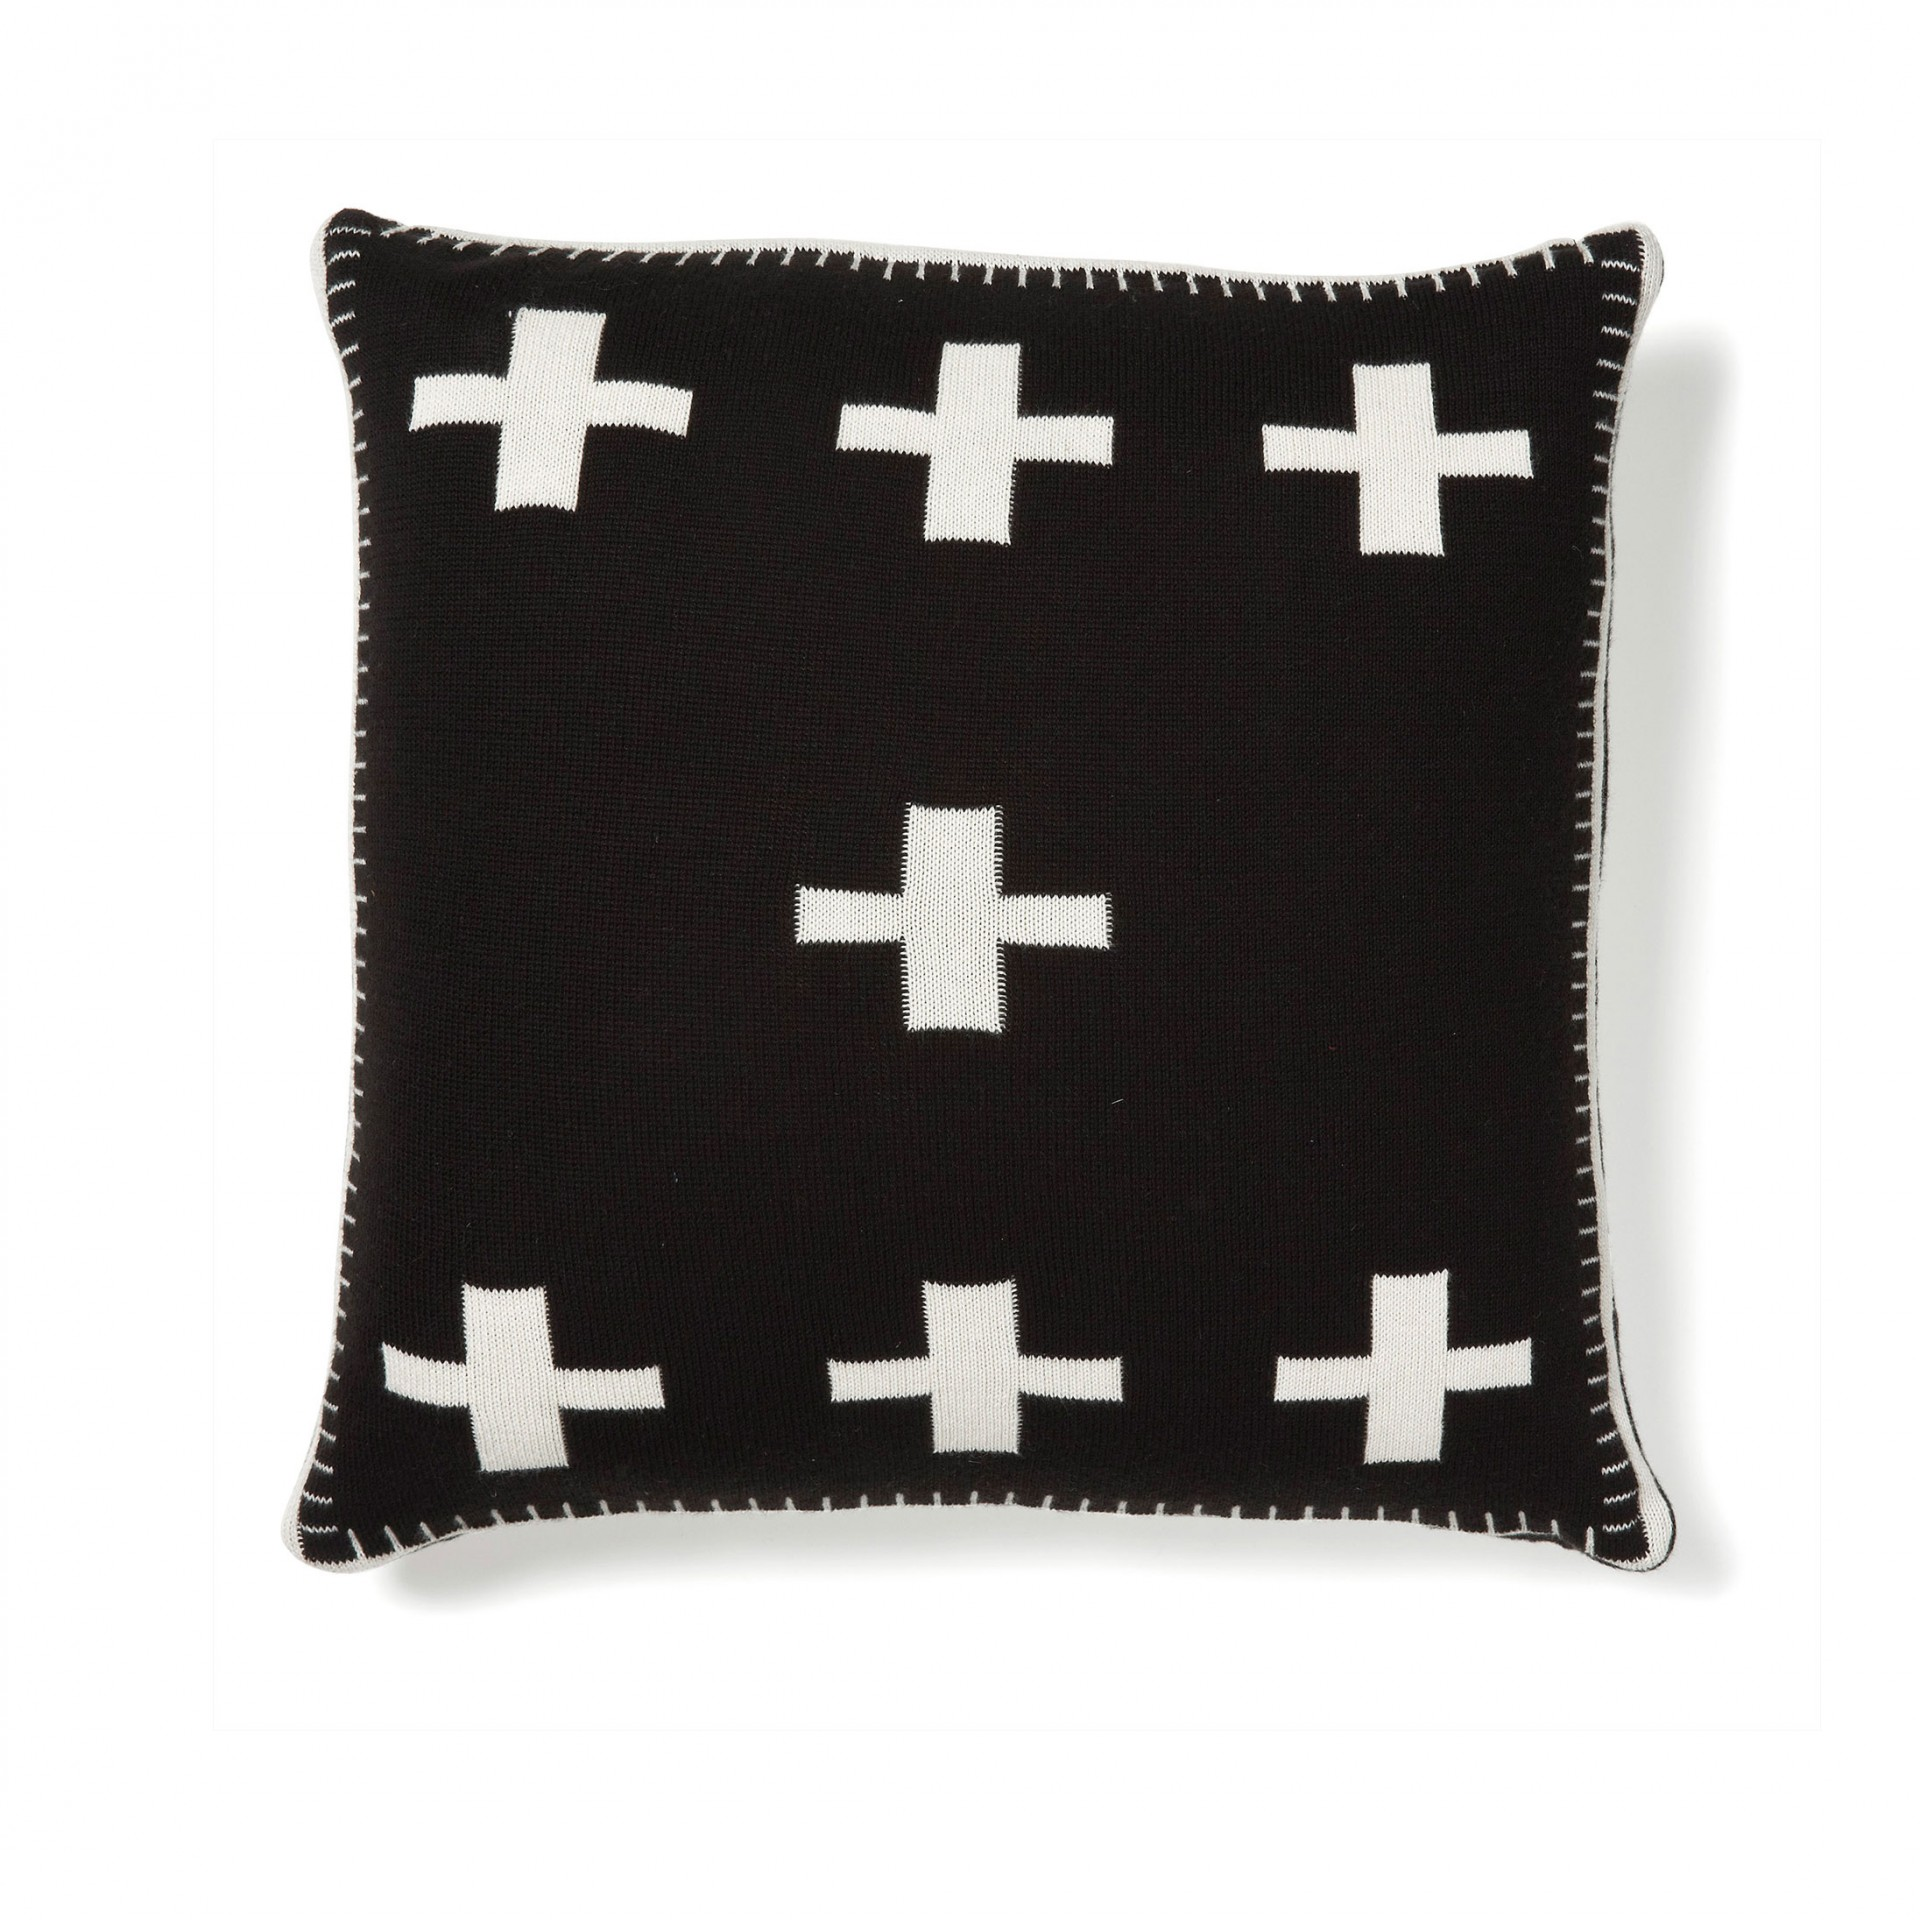 Capa de almofada reversível, preto/branco, 45x45